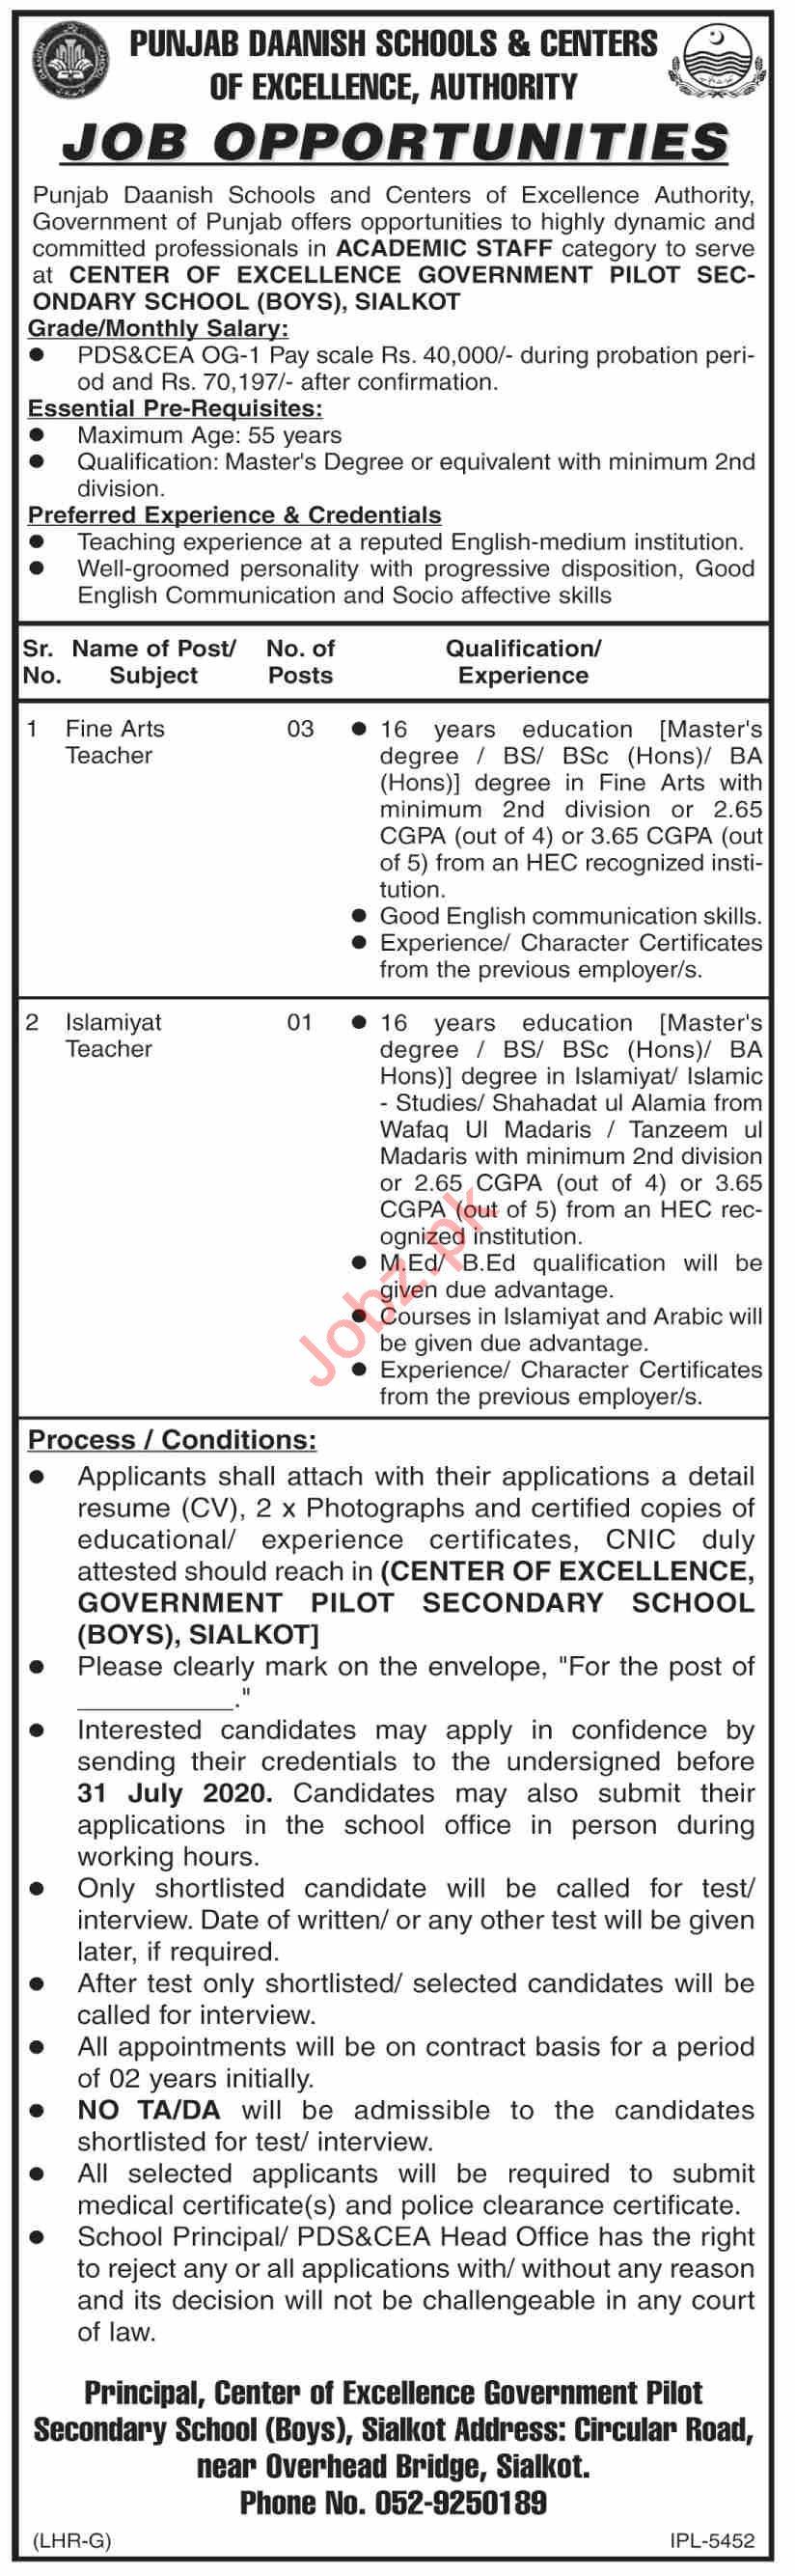 Punjab Daanish Schools Pilot Secondary School Boys Jobs 2020